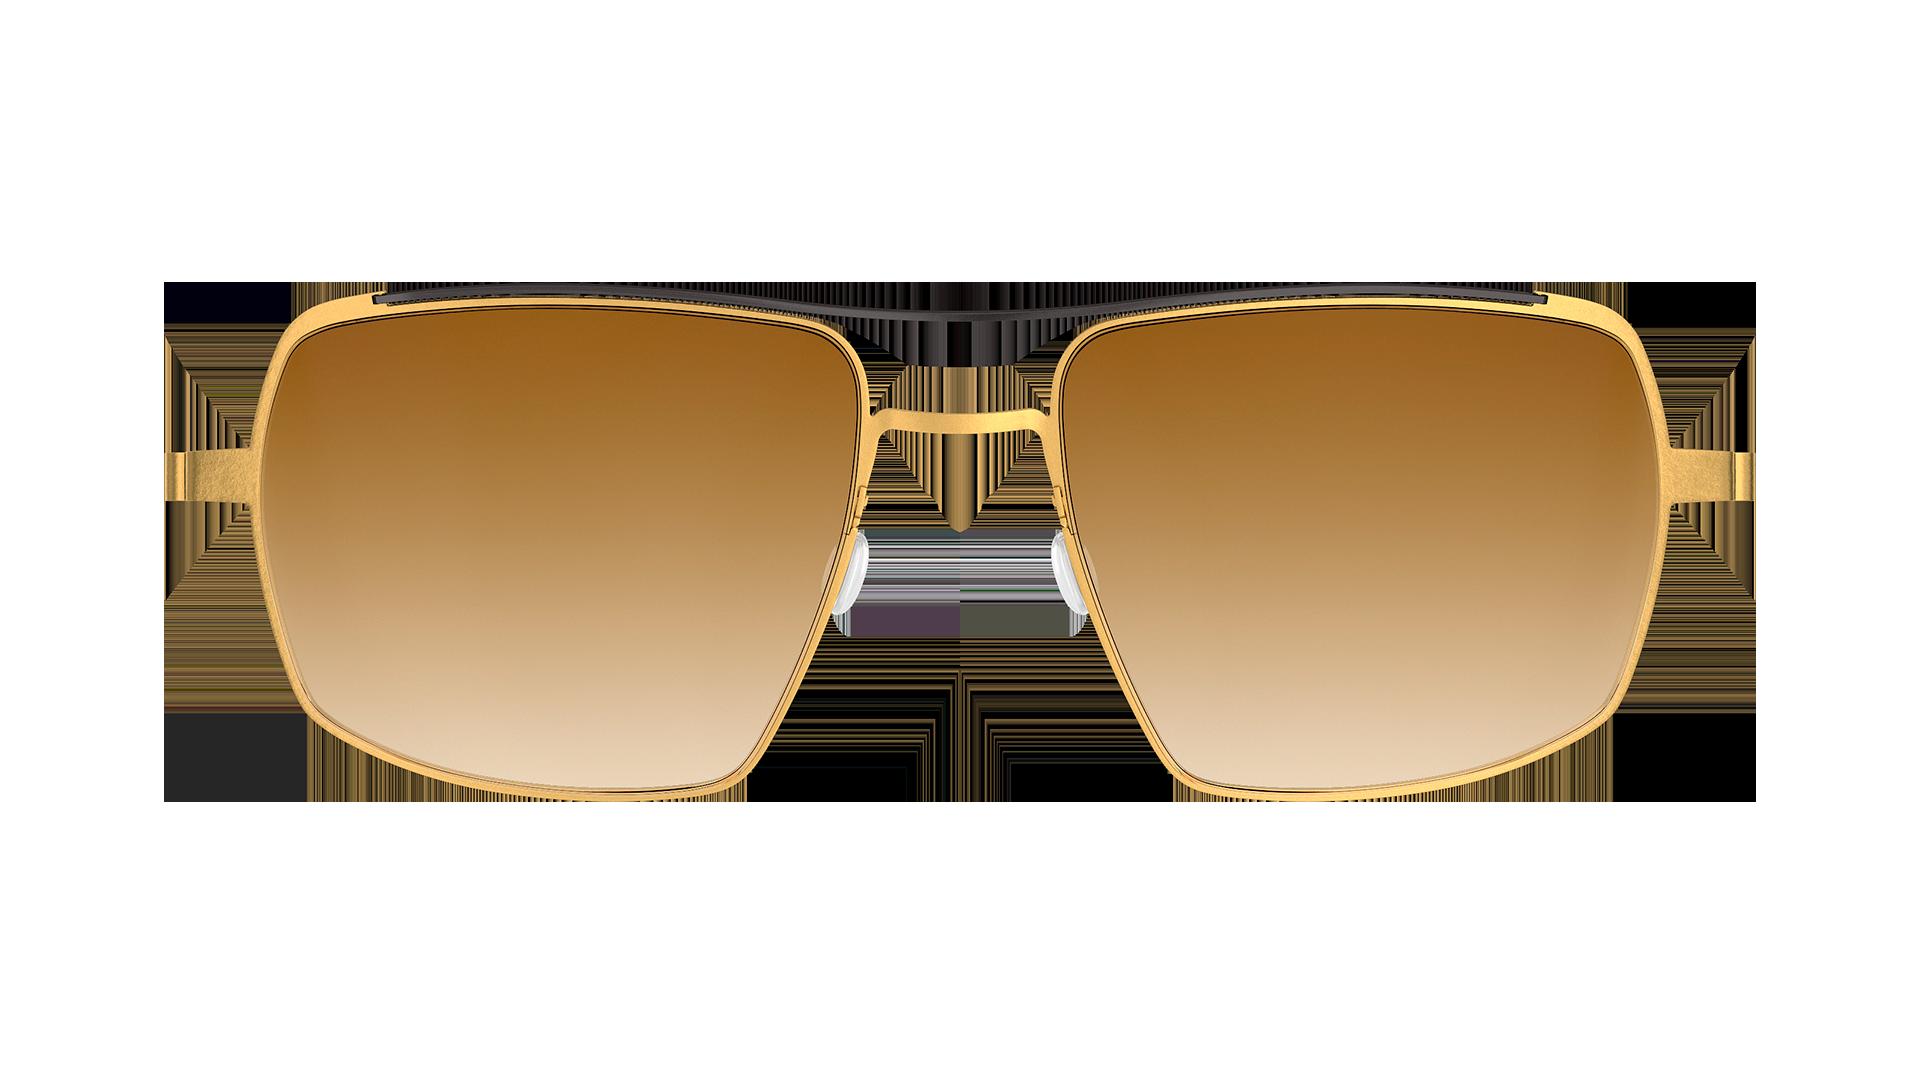 8909 – GT/PU9/SL10